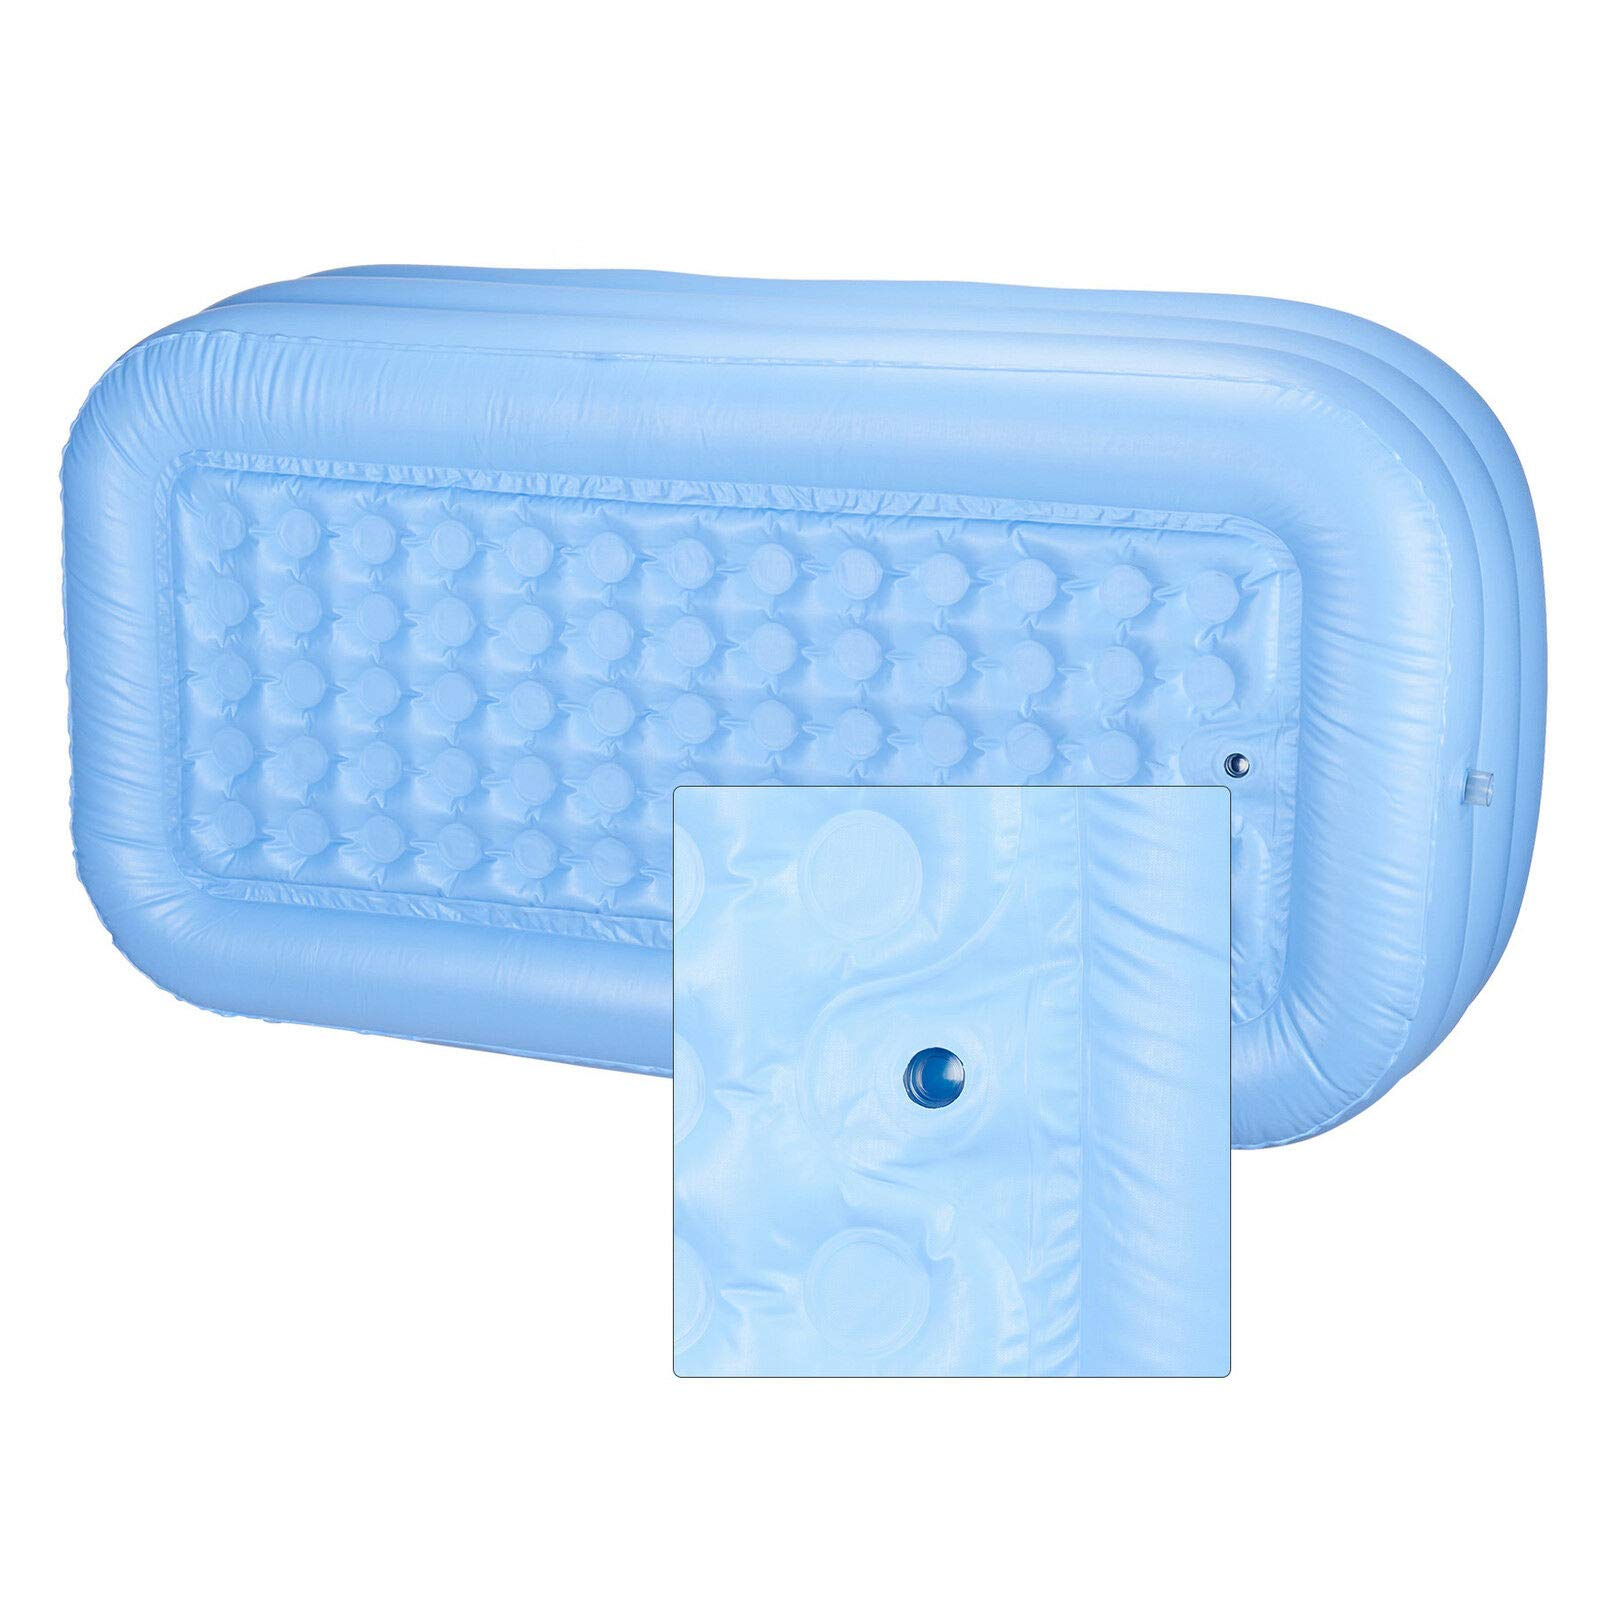 LZHQT Blow Up Adult PVC Folding Portable Foldable Bathtub Inflatable Bath Tub Air Pump by LZHQT (Image #3)